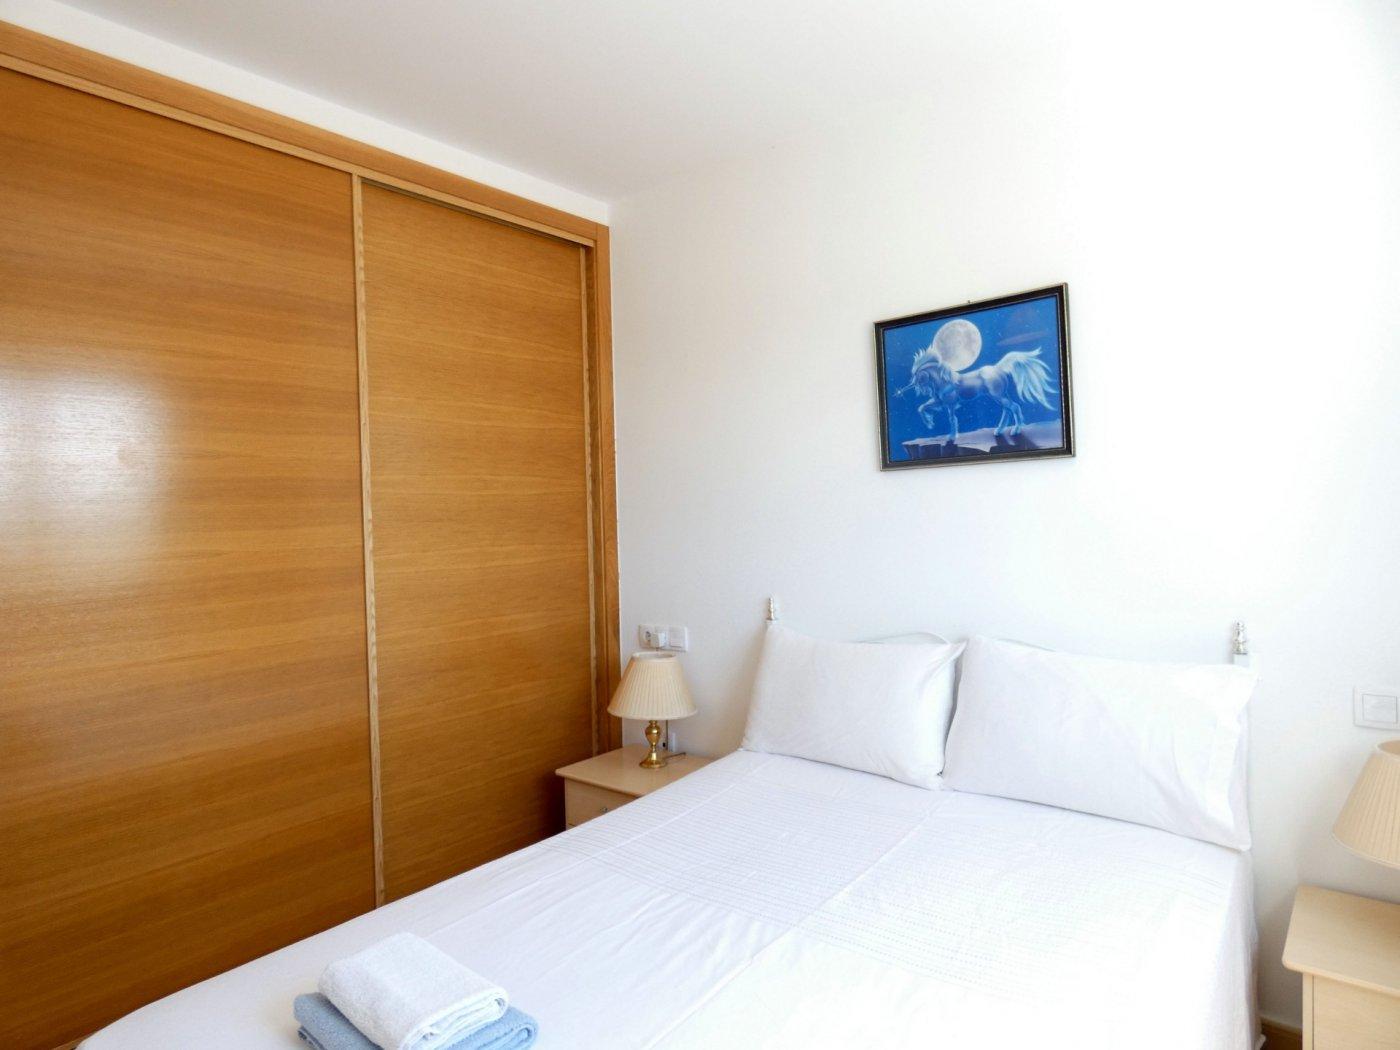 Gallery Image 7 of Key-Ready 2 Bedroom Apartment Overlooking the Citrus Groves in Jardin 10, Condado de Alhama